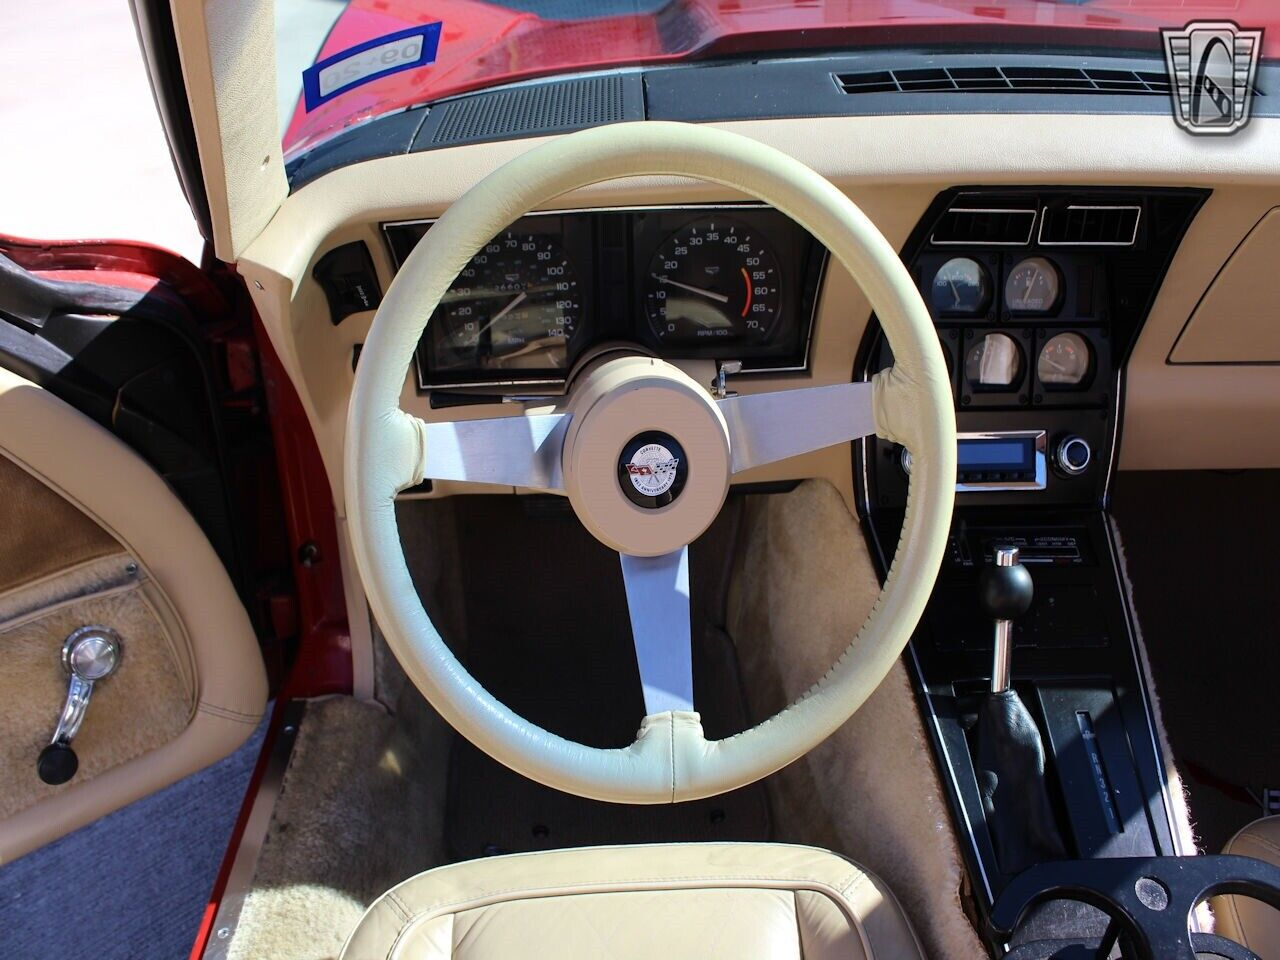 1978 Red Chevrolet Corvette   | C3 Corvette Photo 9